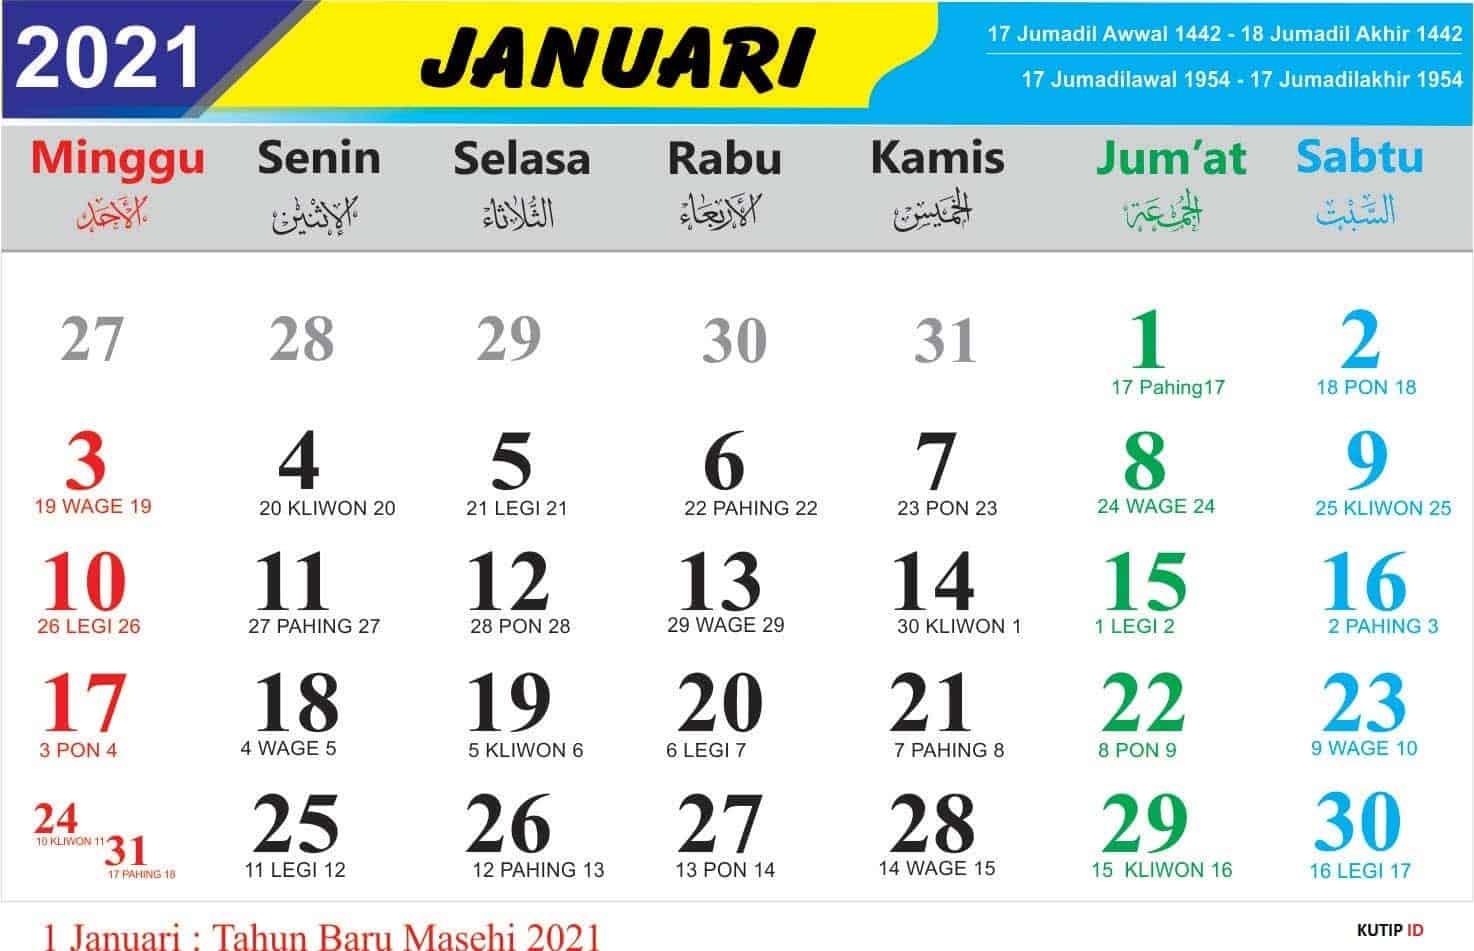 Kalender Bulan Januari 2021 Lengkap Jawa dan Nasional